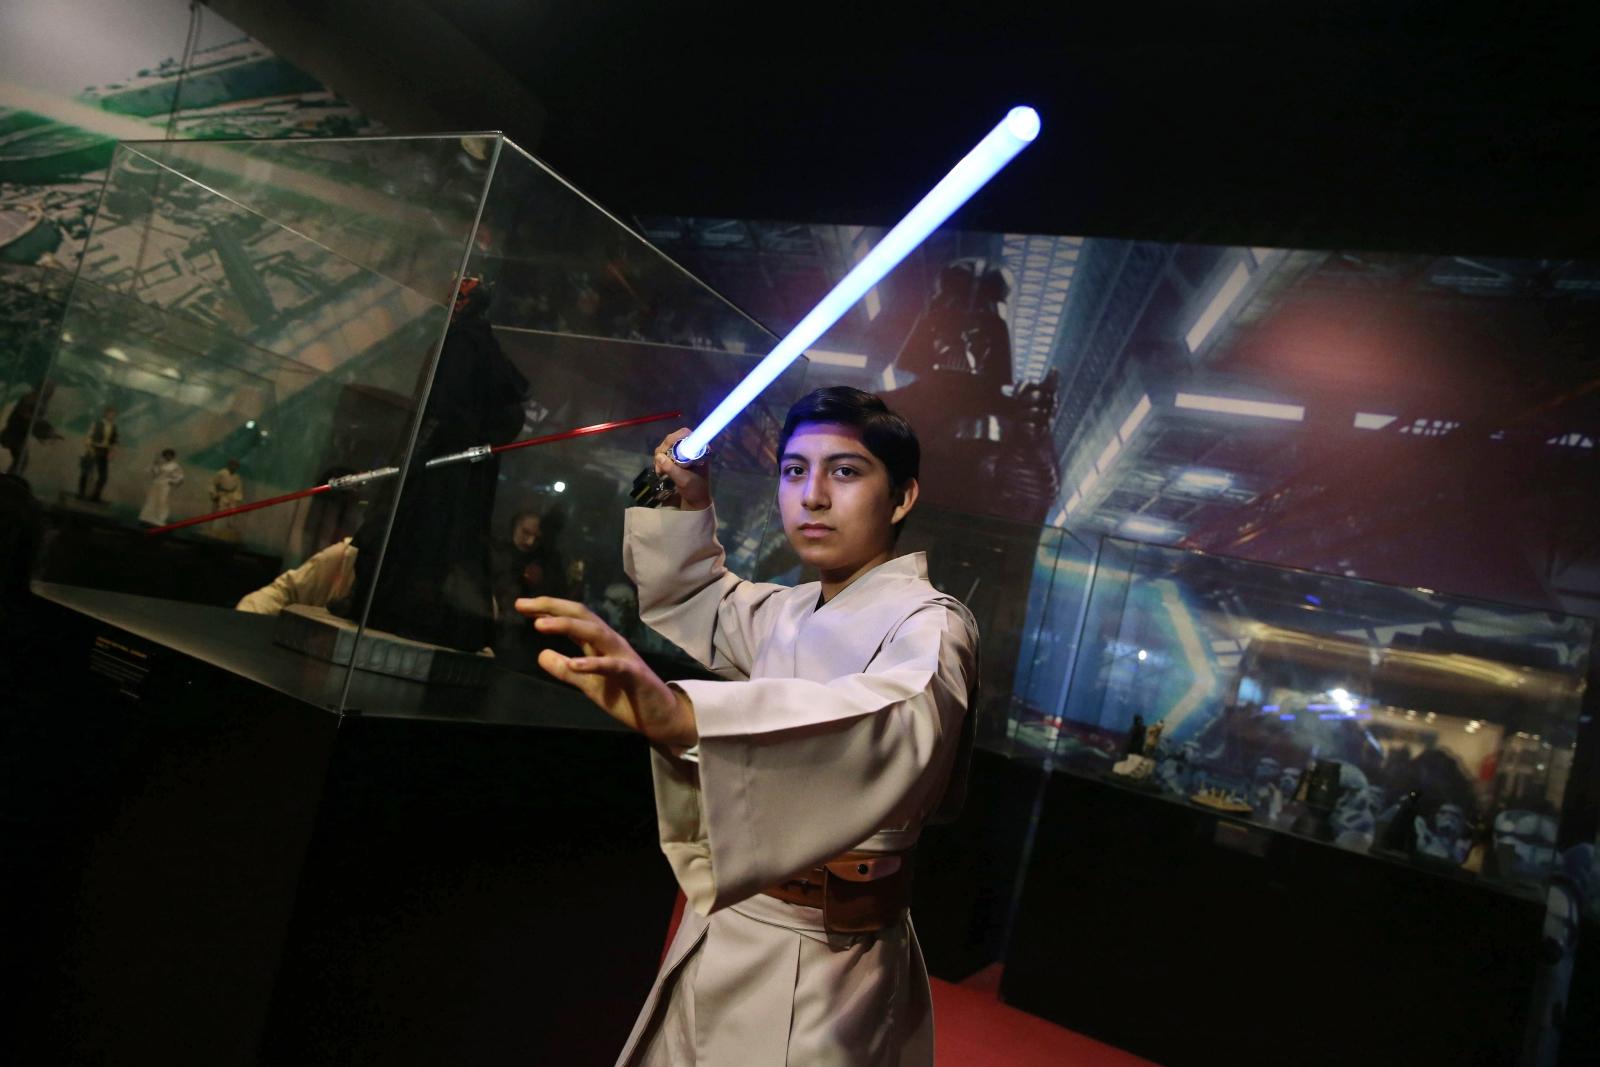 Dzień Star Wars w Peru. Fot. PAP/EPA/ERNESTO ARIAS